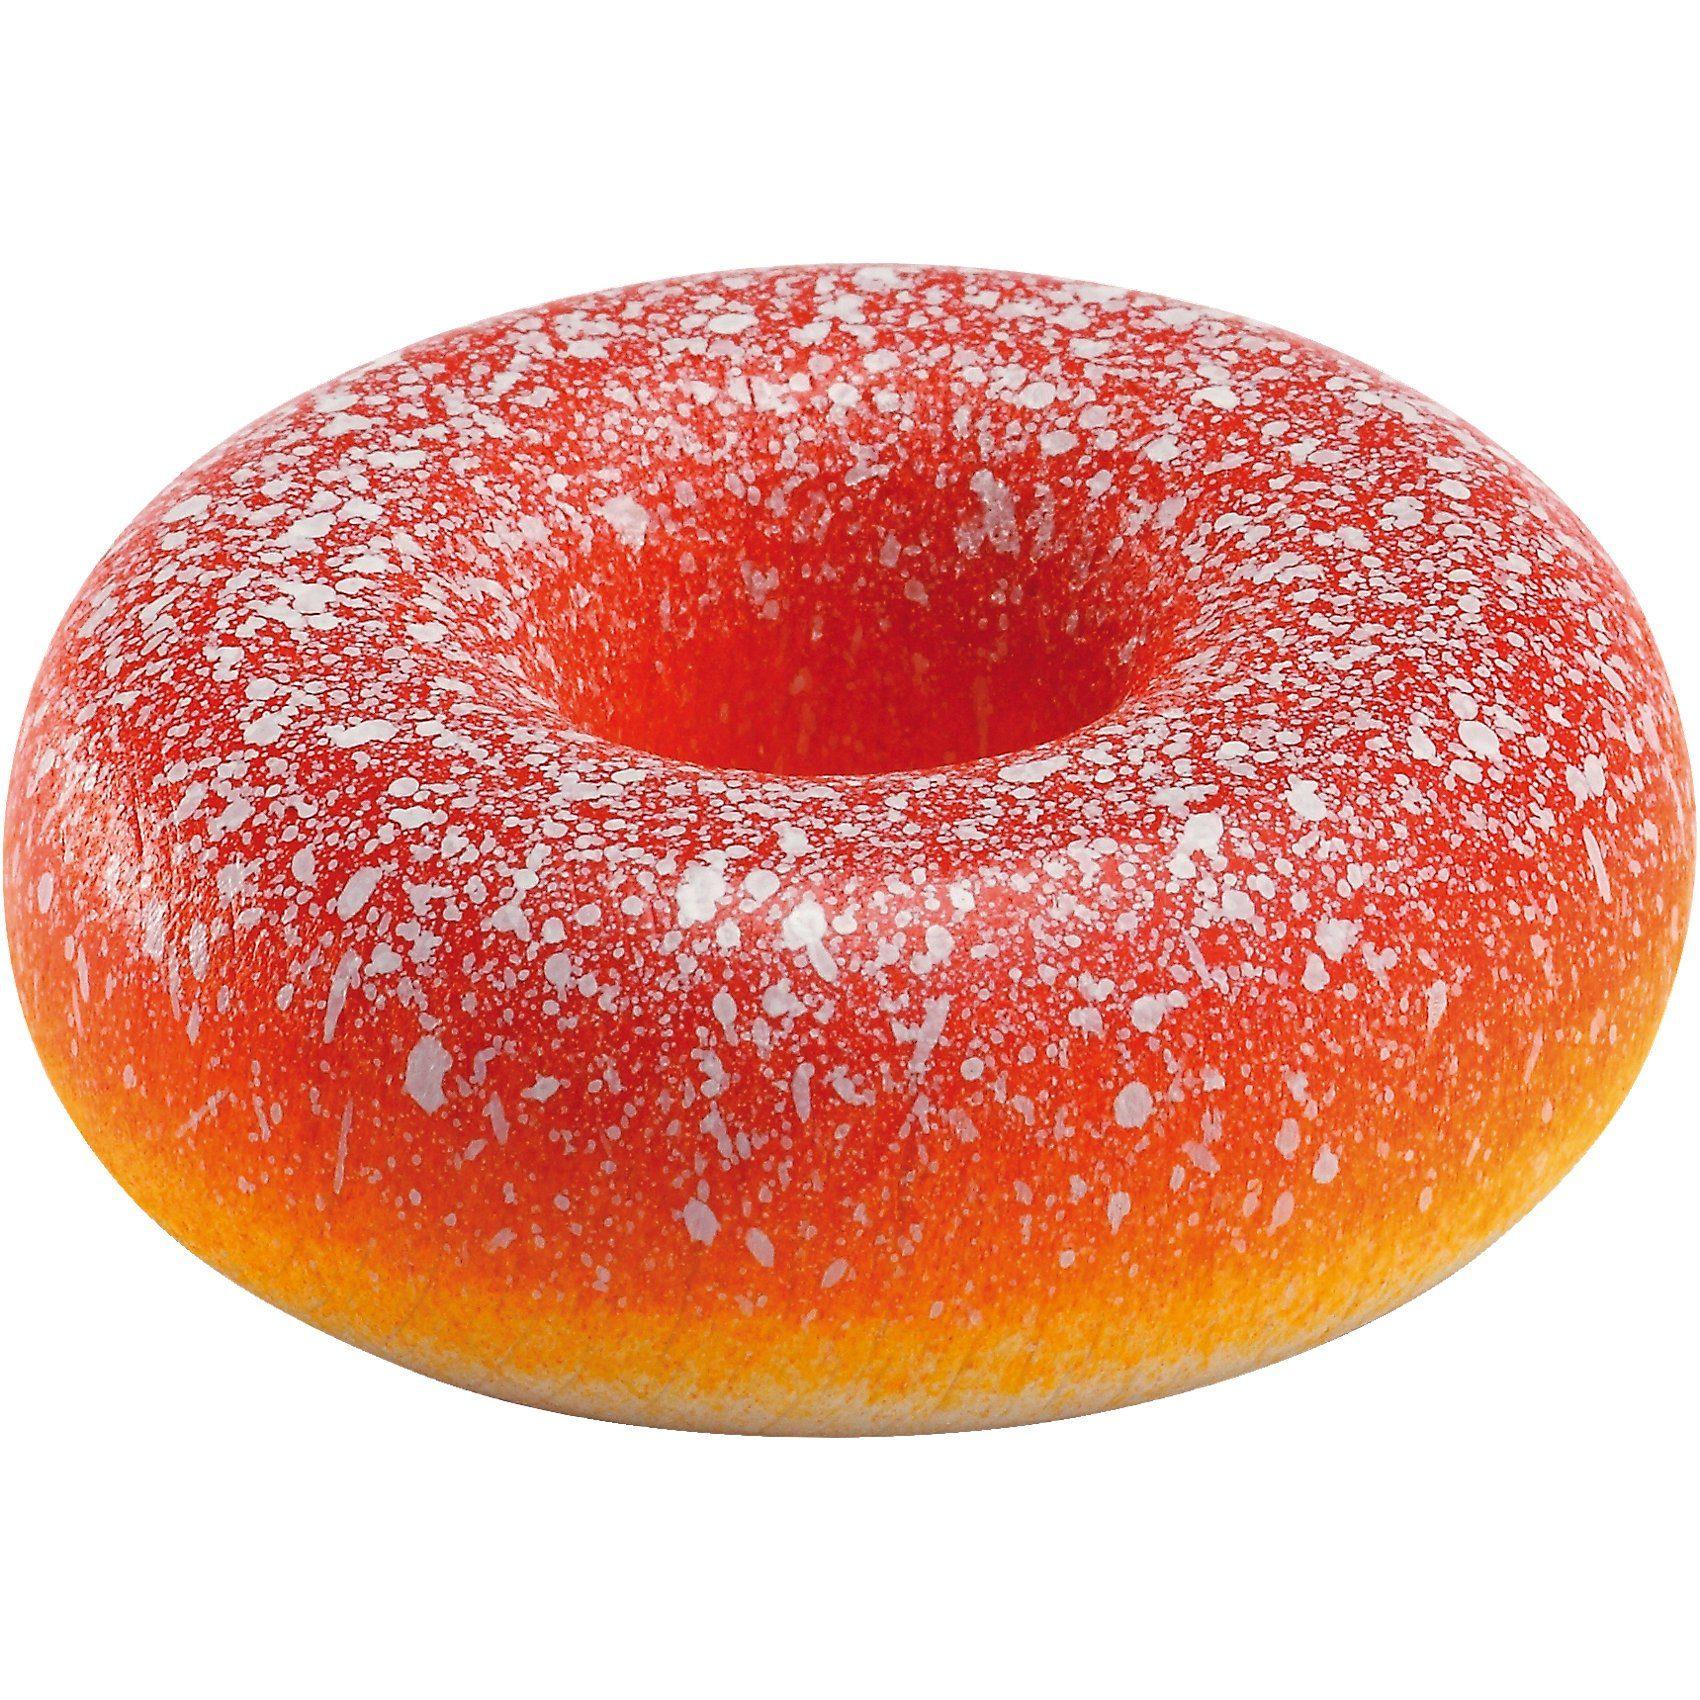 Erzi® Spiellebensmittel Doughnut